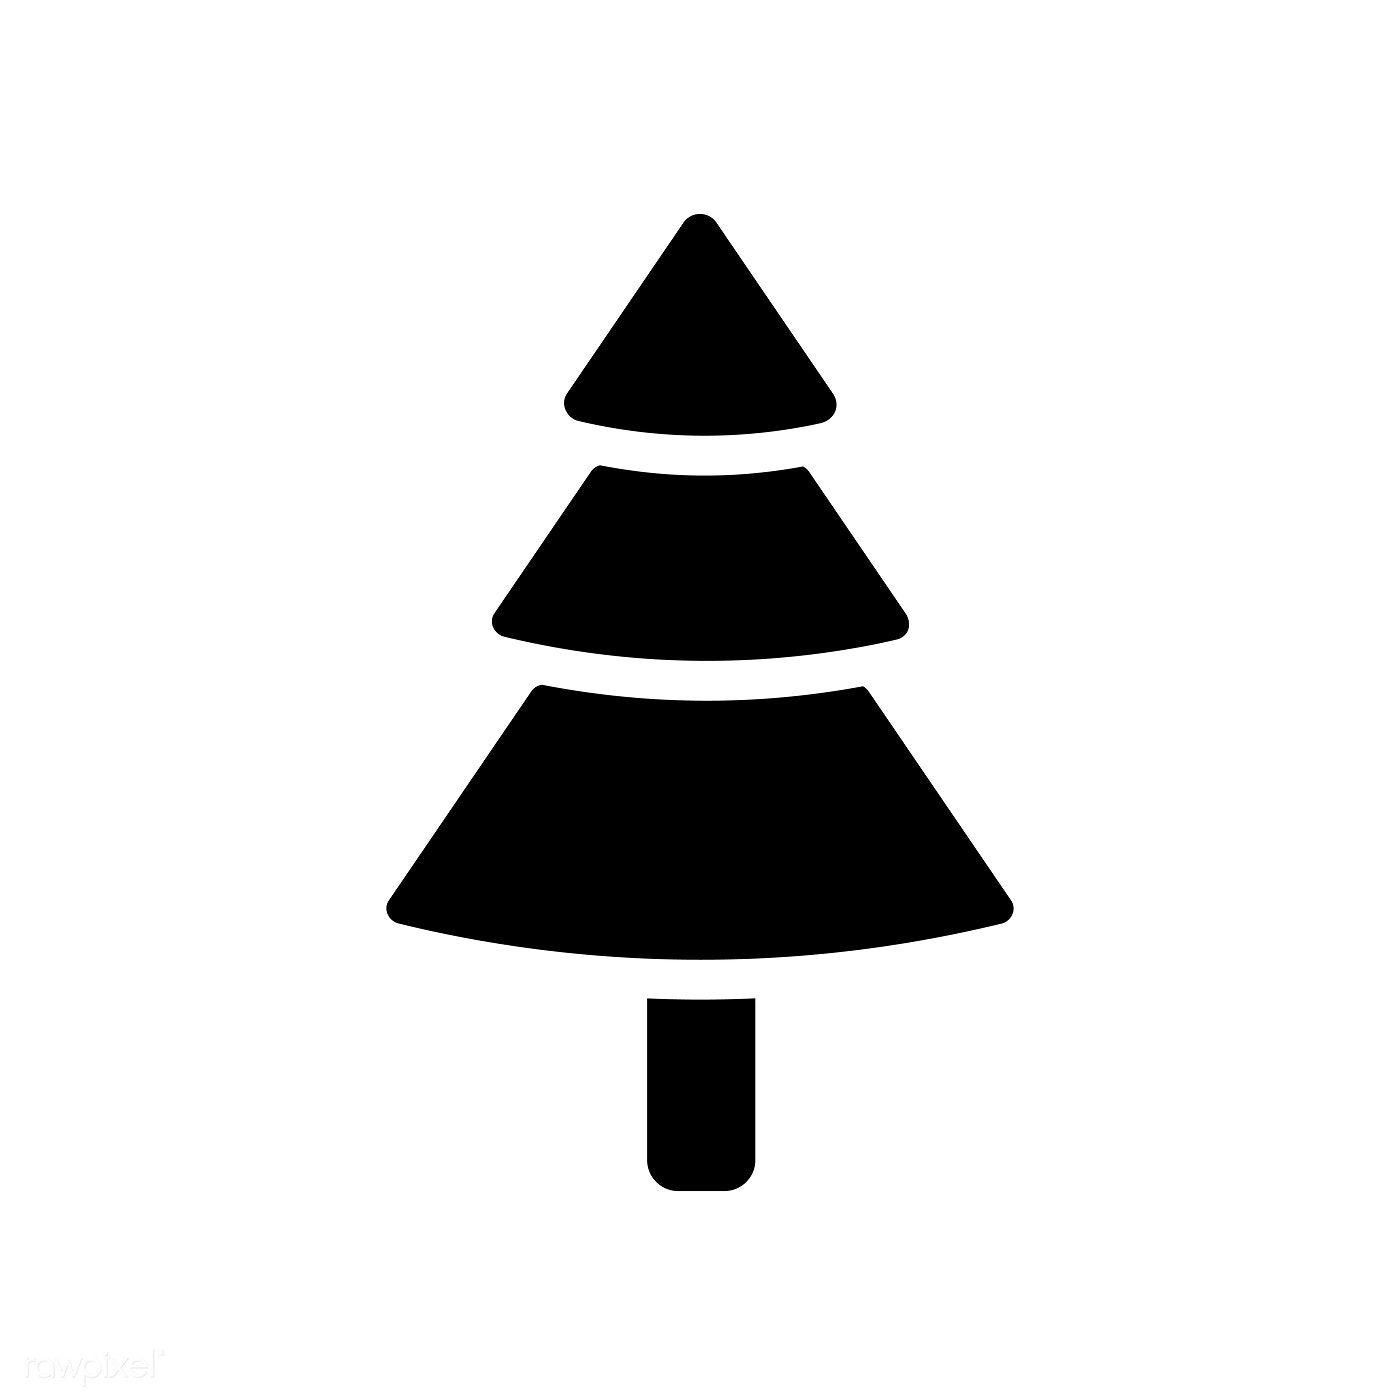 Christmas Tree Icon Decoration Vector Free Image By Rawpixel Com Tree Icon Christmas Icons Christmas Design